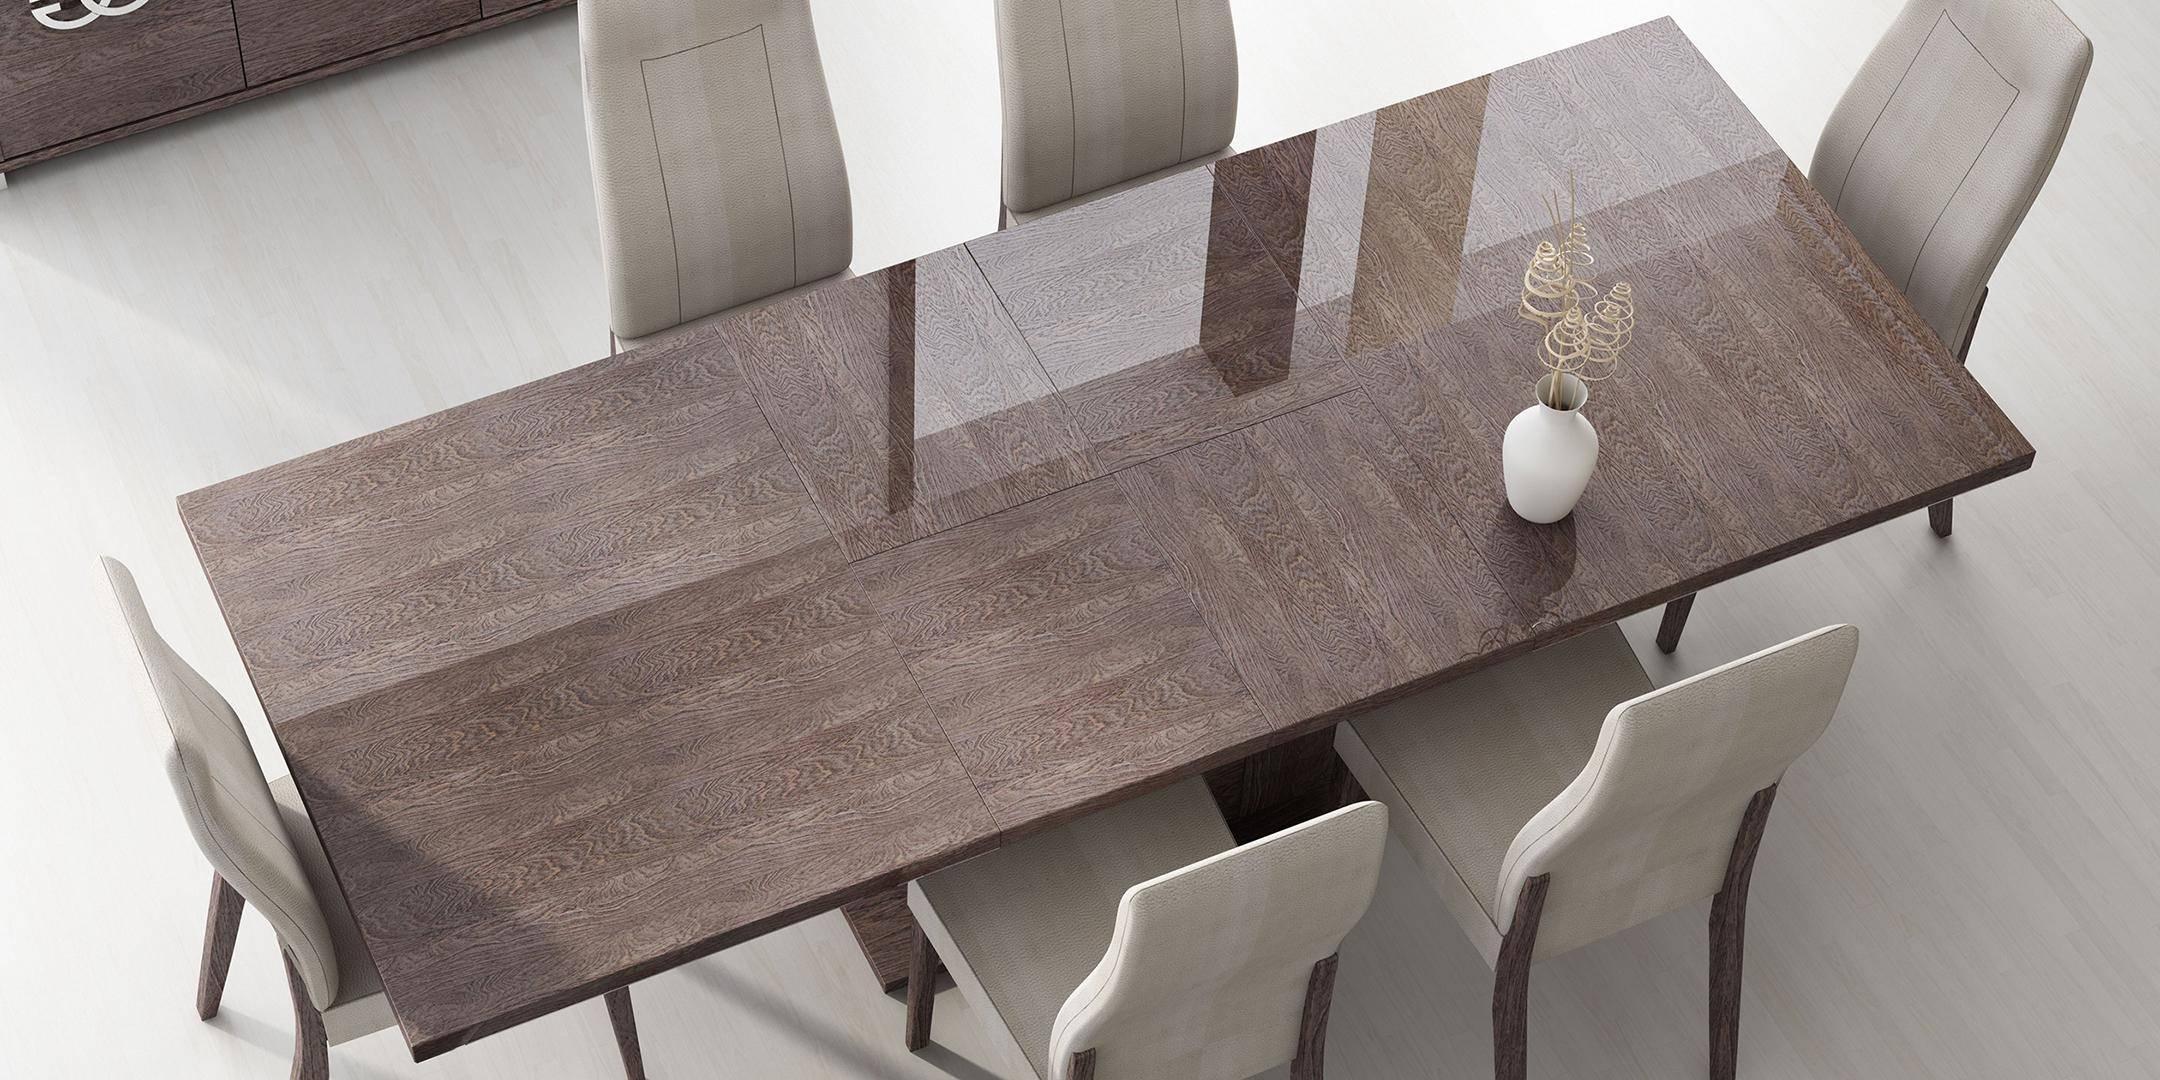 Buy Esf Georgia Dining Table Set 8 Pcs In Silver Wenge Cream Microfiber Online